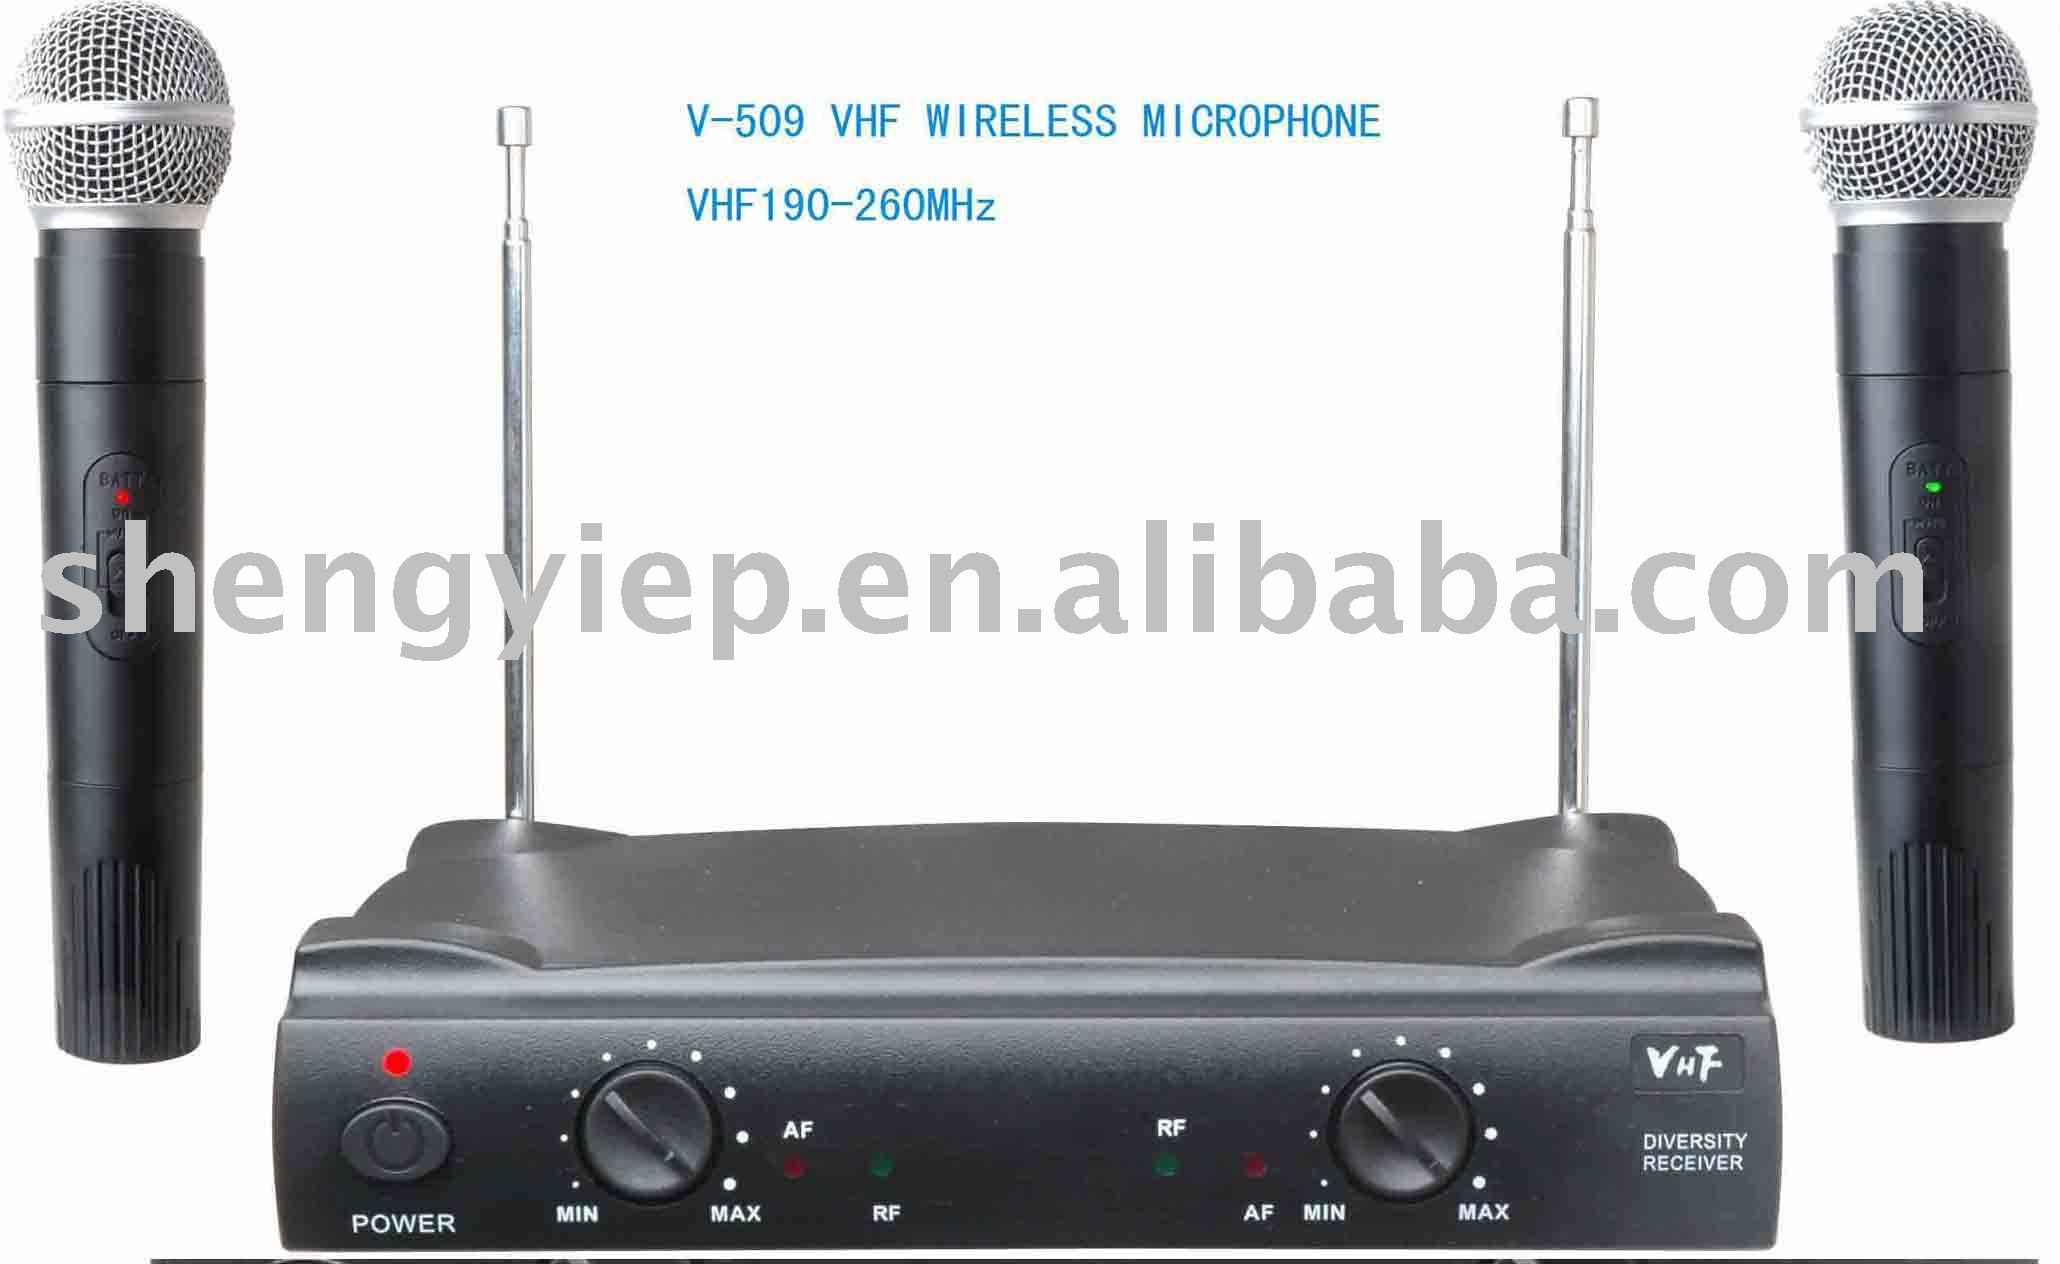 Vhf Wireless Microphone V-509